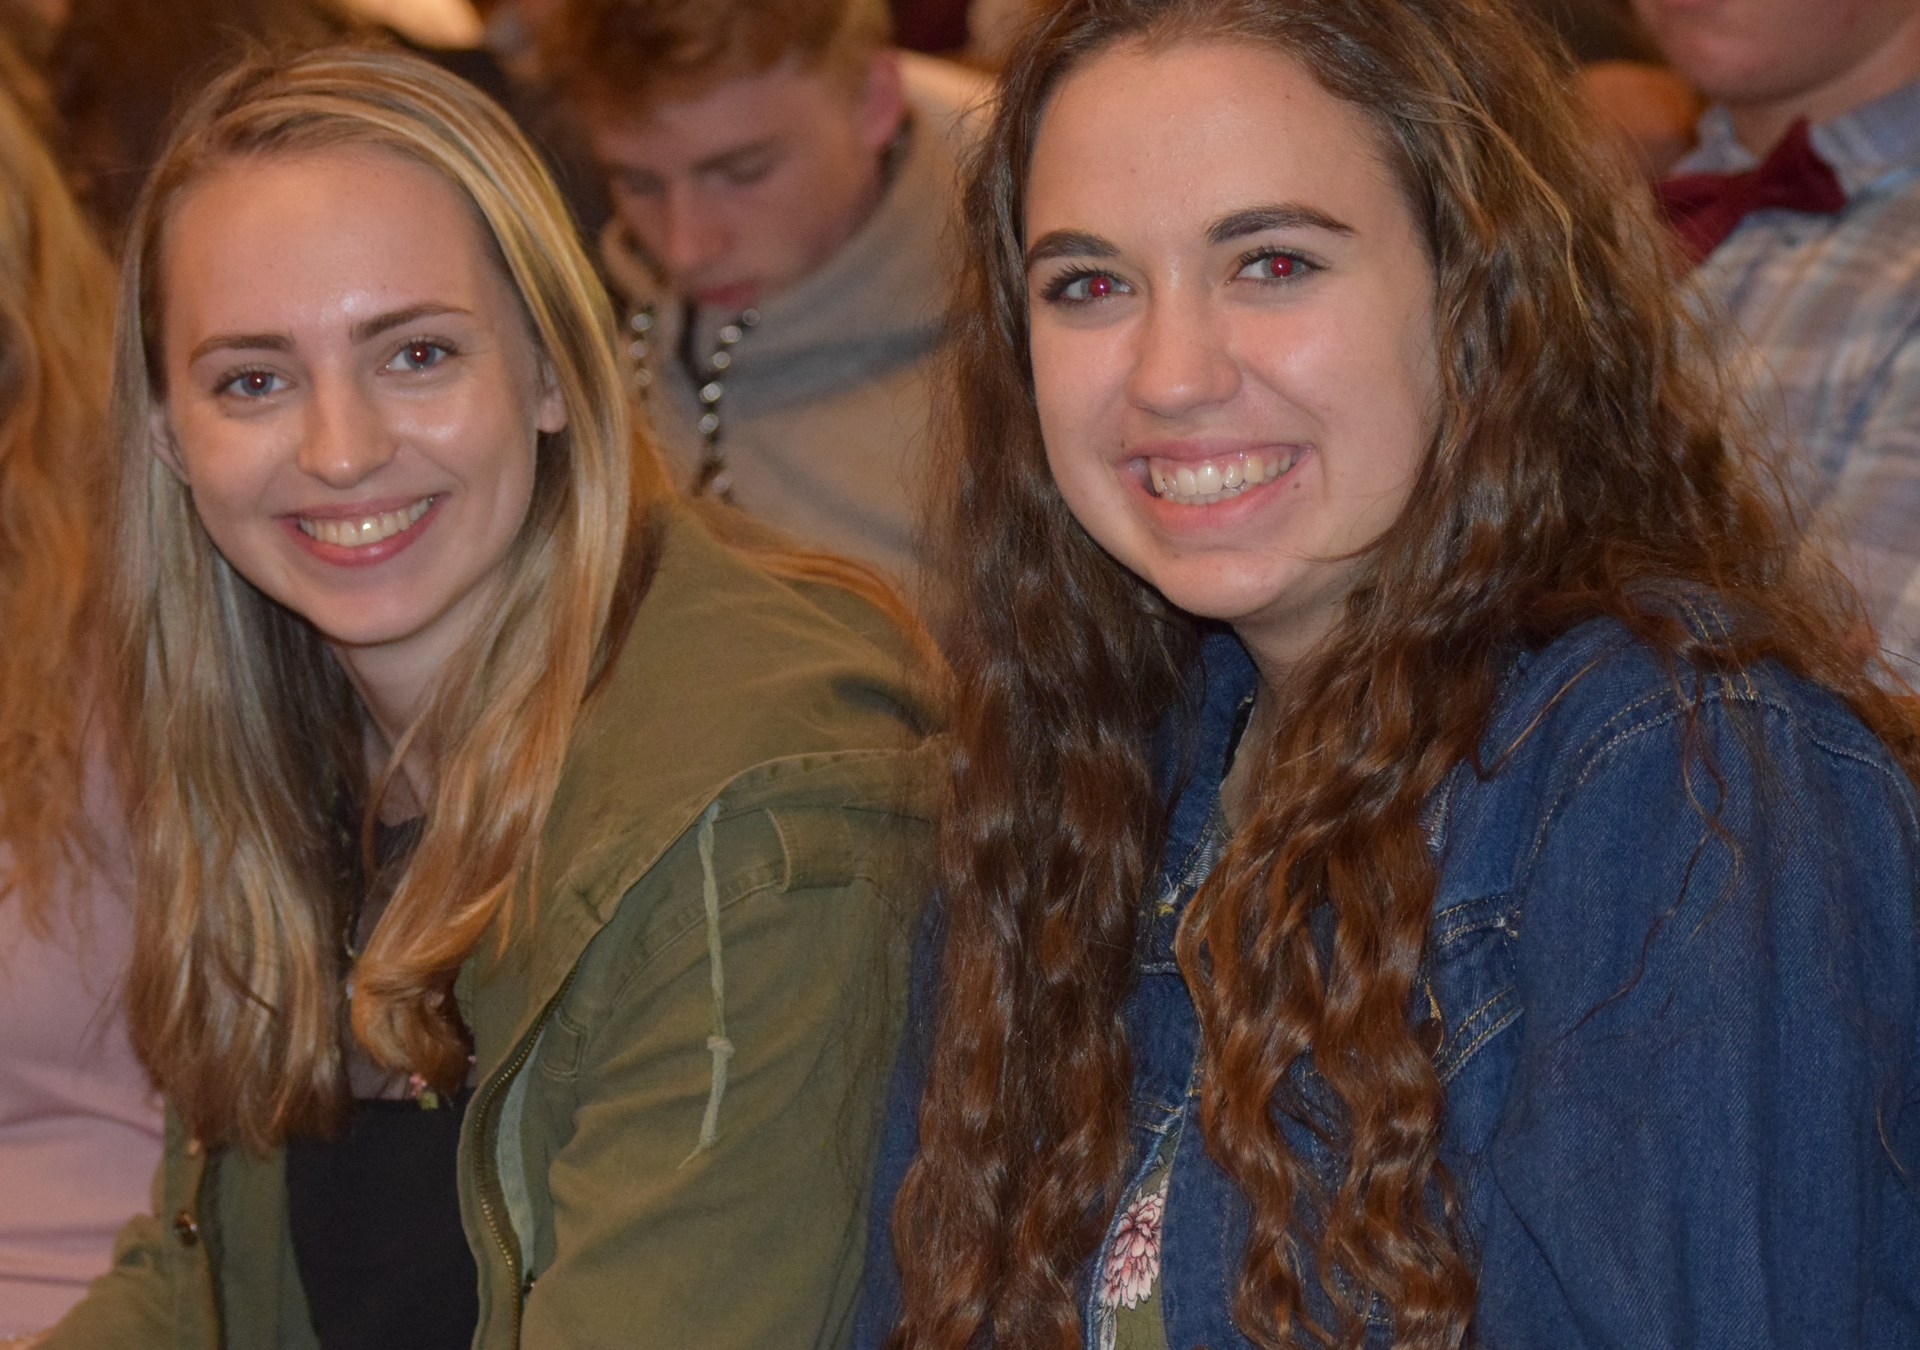 Two girls sitting in church pew.